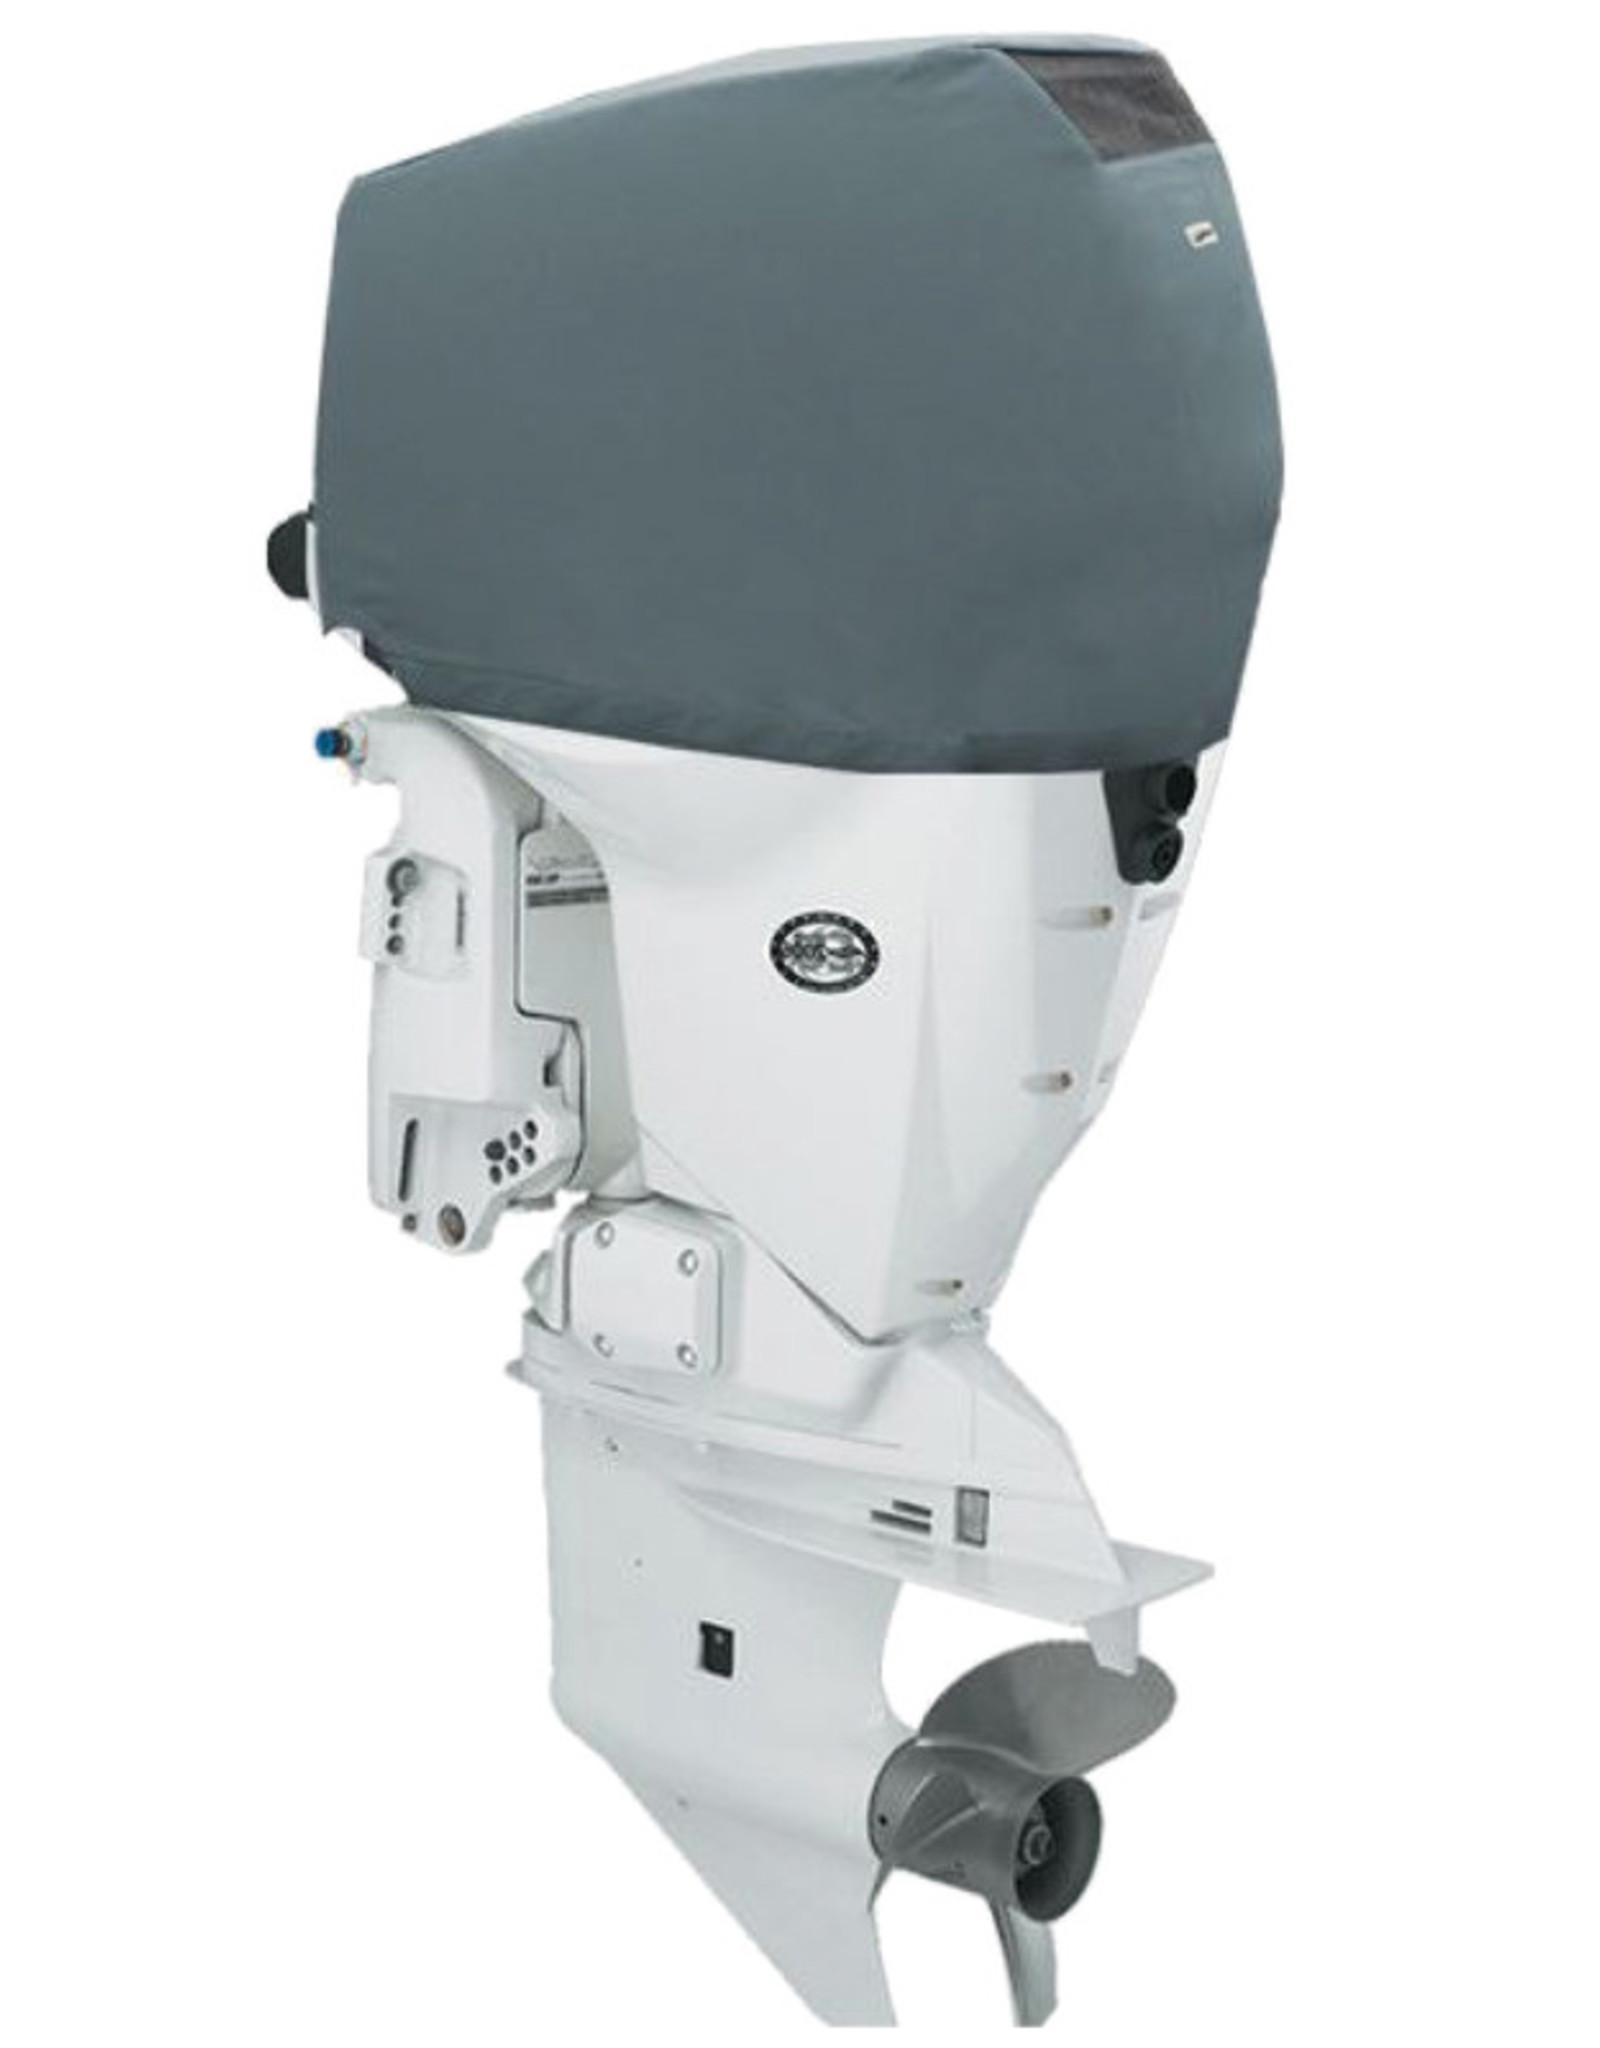 Osculati Geventileerde Evinrude afdekhoes 40 t/m 300 PK